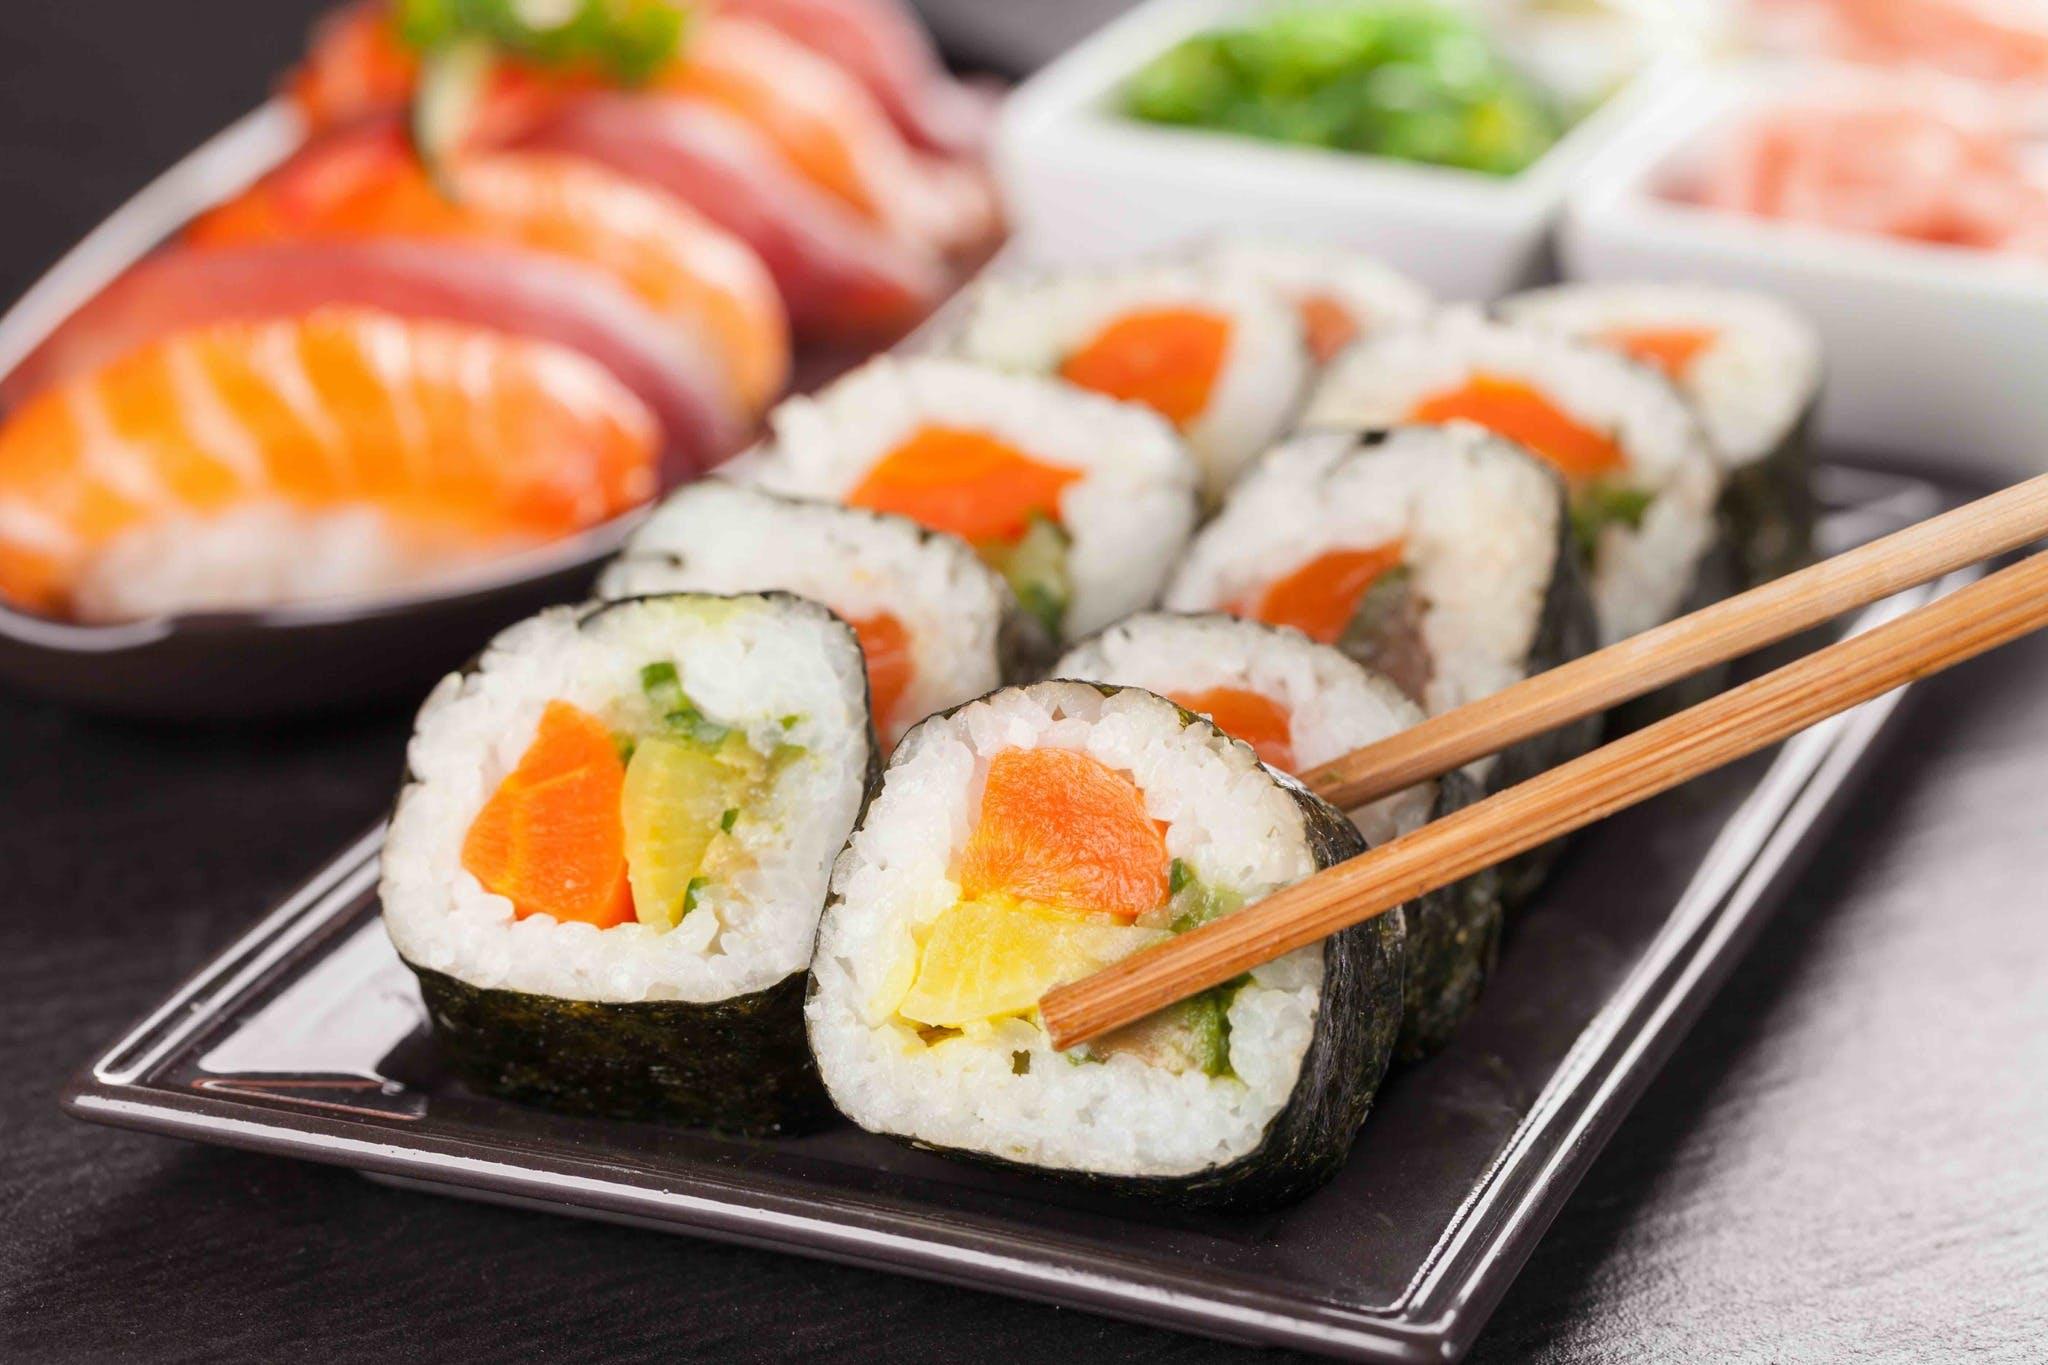 Island Sushi in Appleton - Highlight